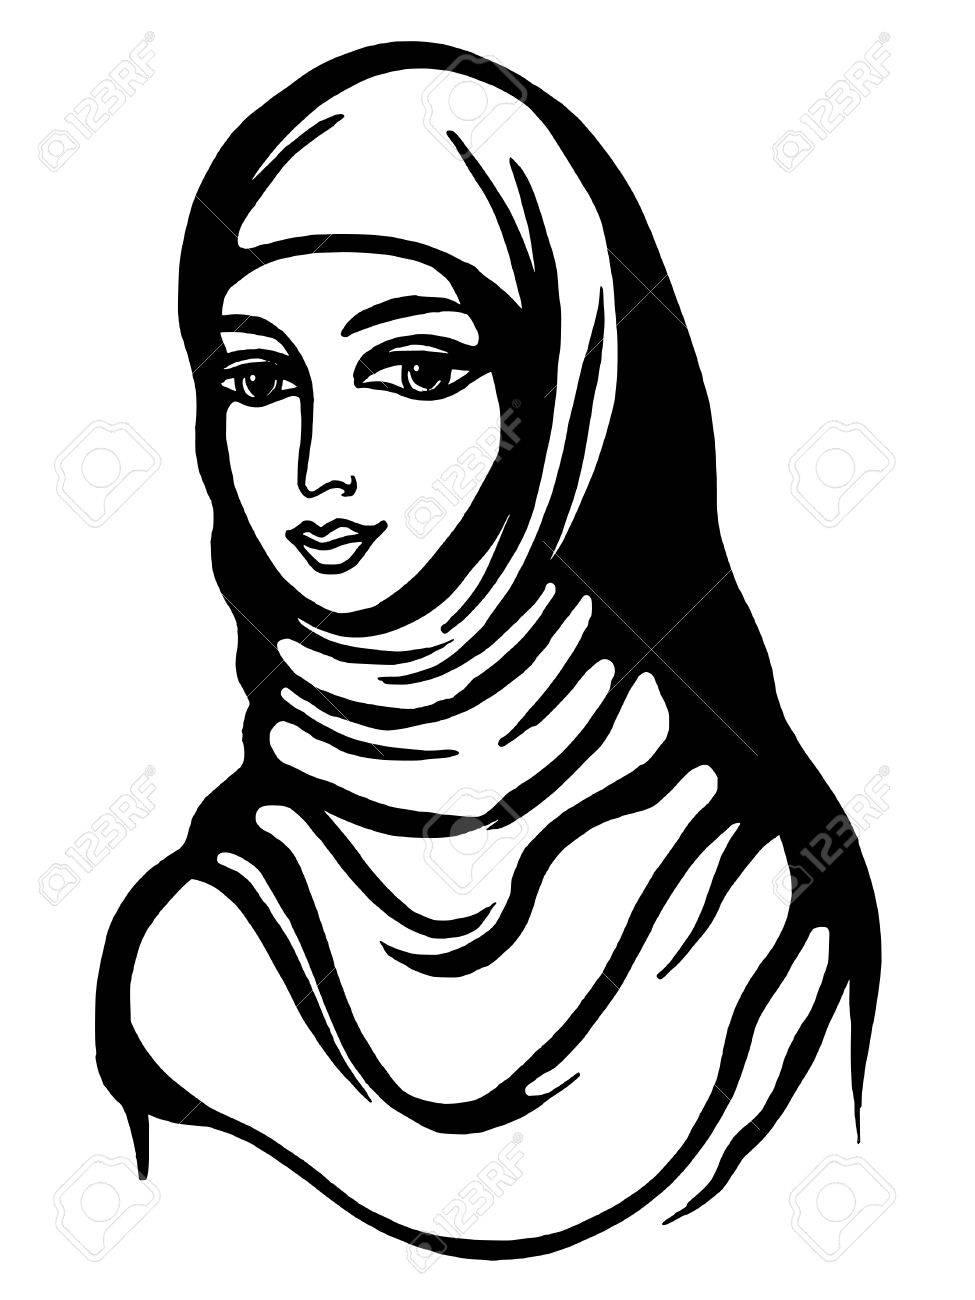 975x1300 Hand Drawn, Cartoon, Sketch Illustration Of Muslim Girl Royalty